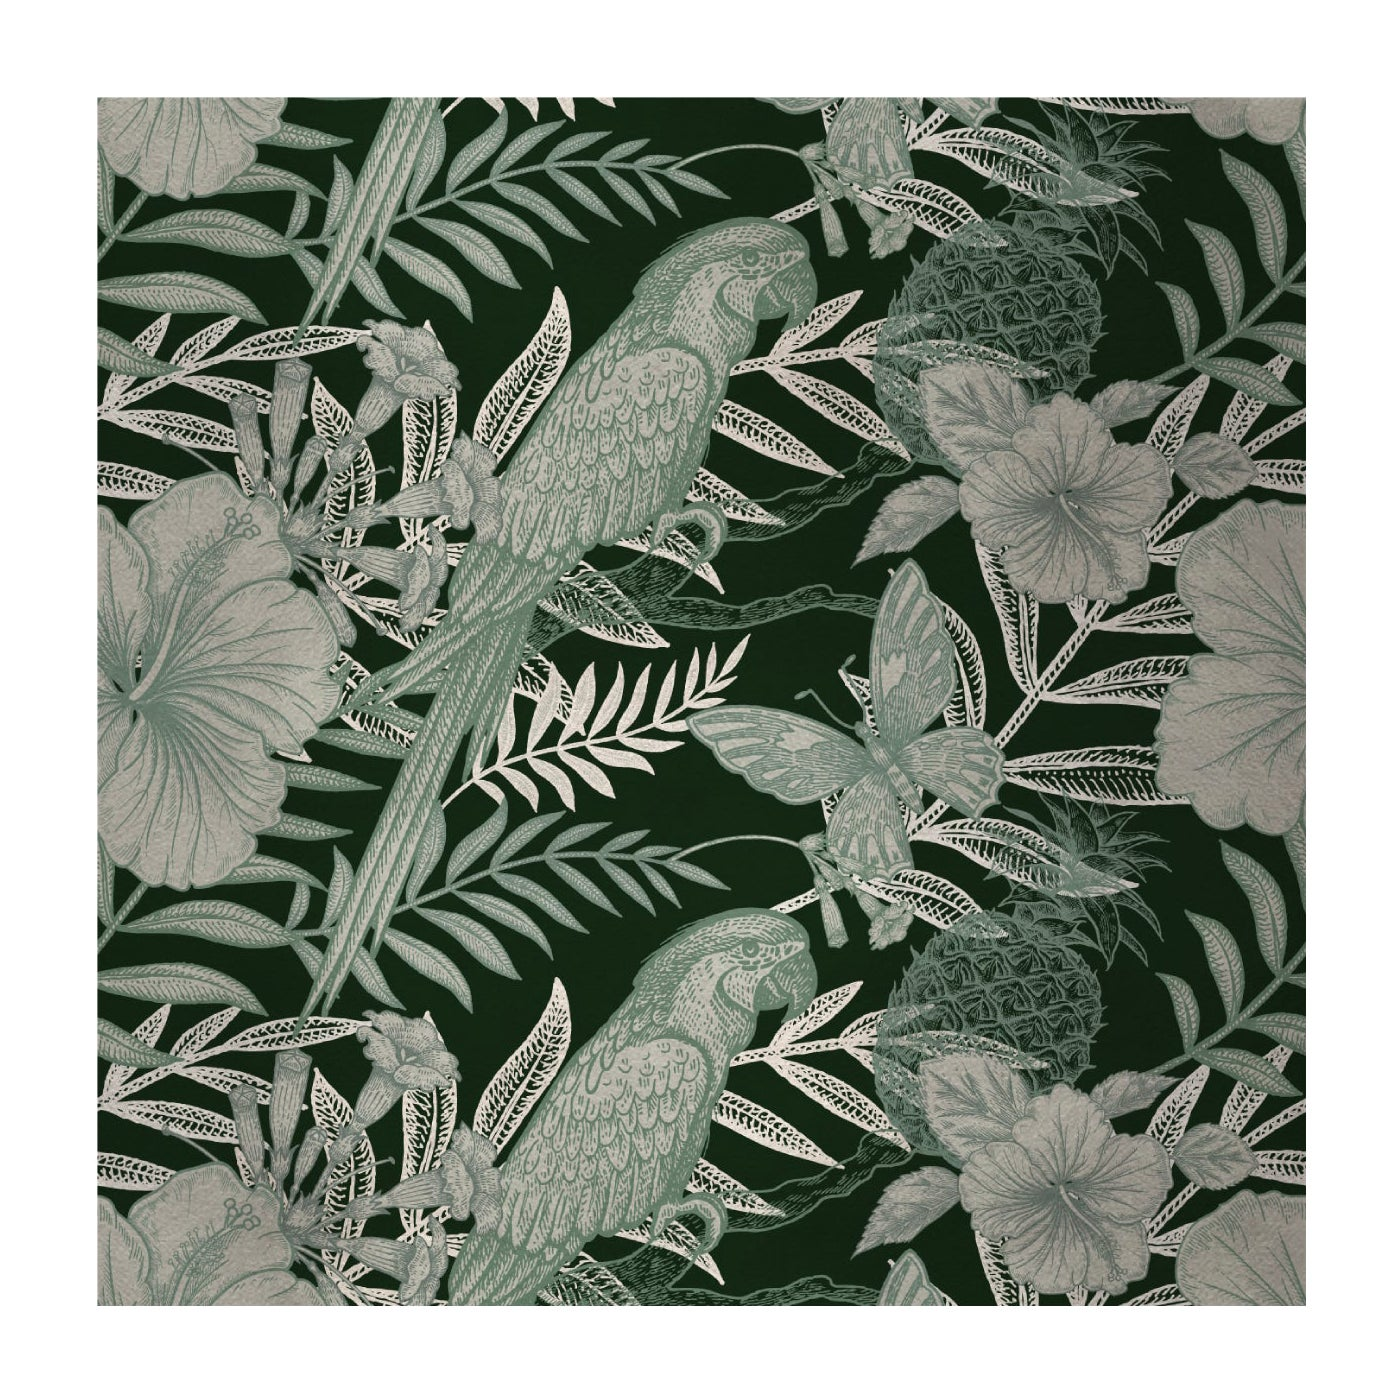 Parrots Green Panel